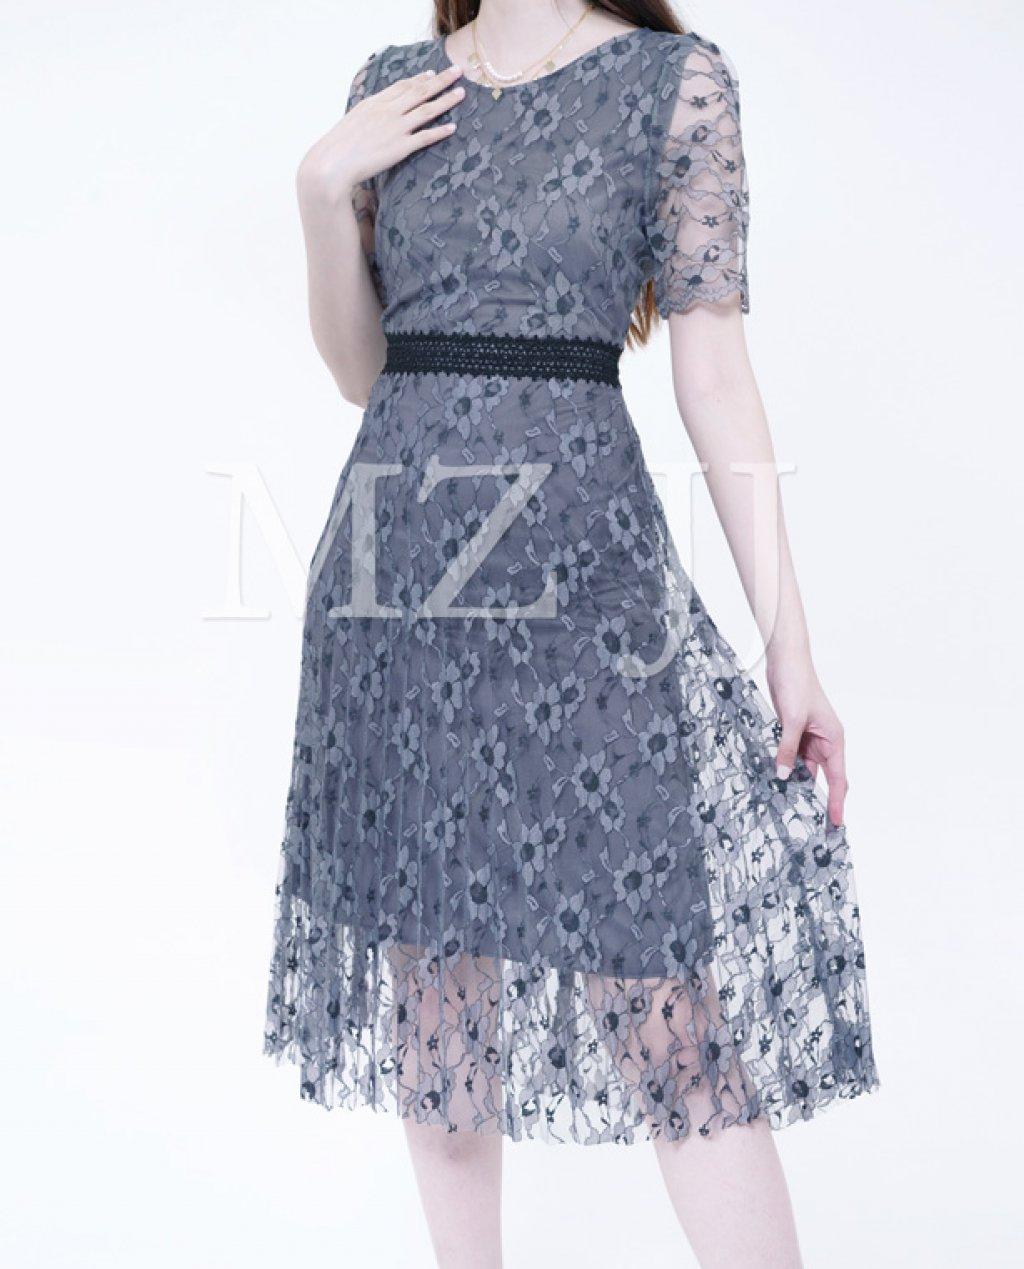 OP13060LGY Dress